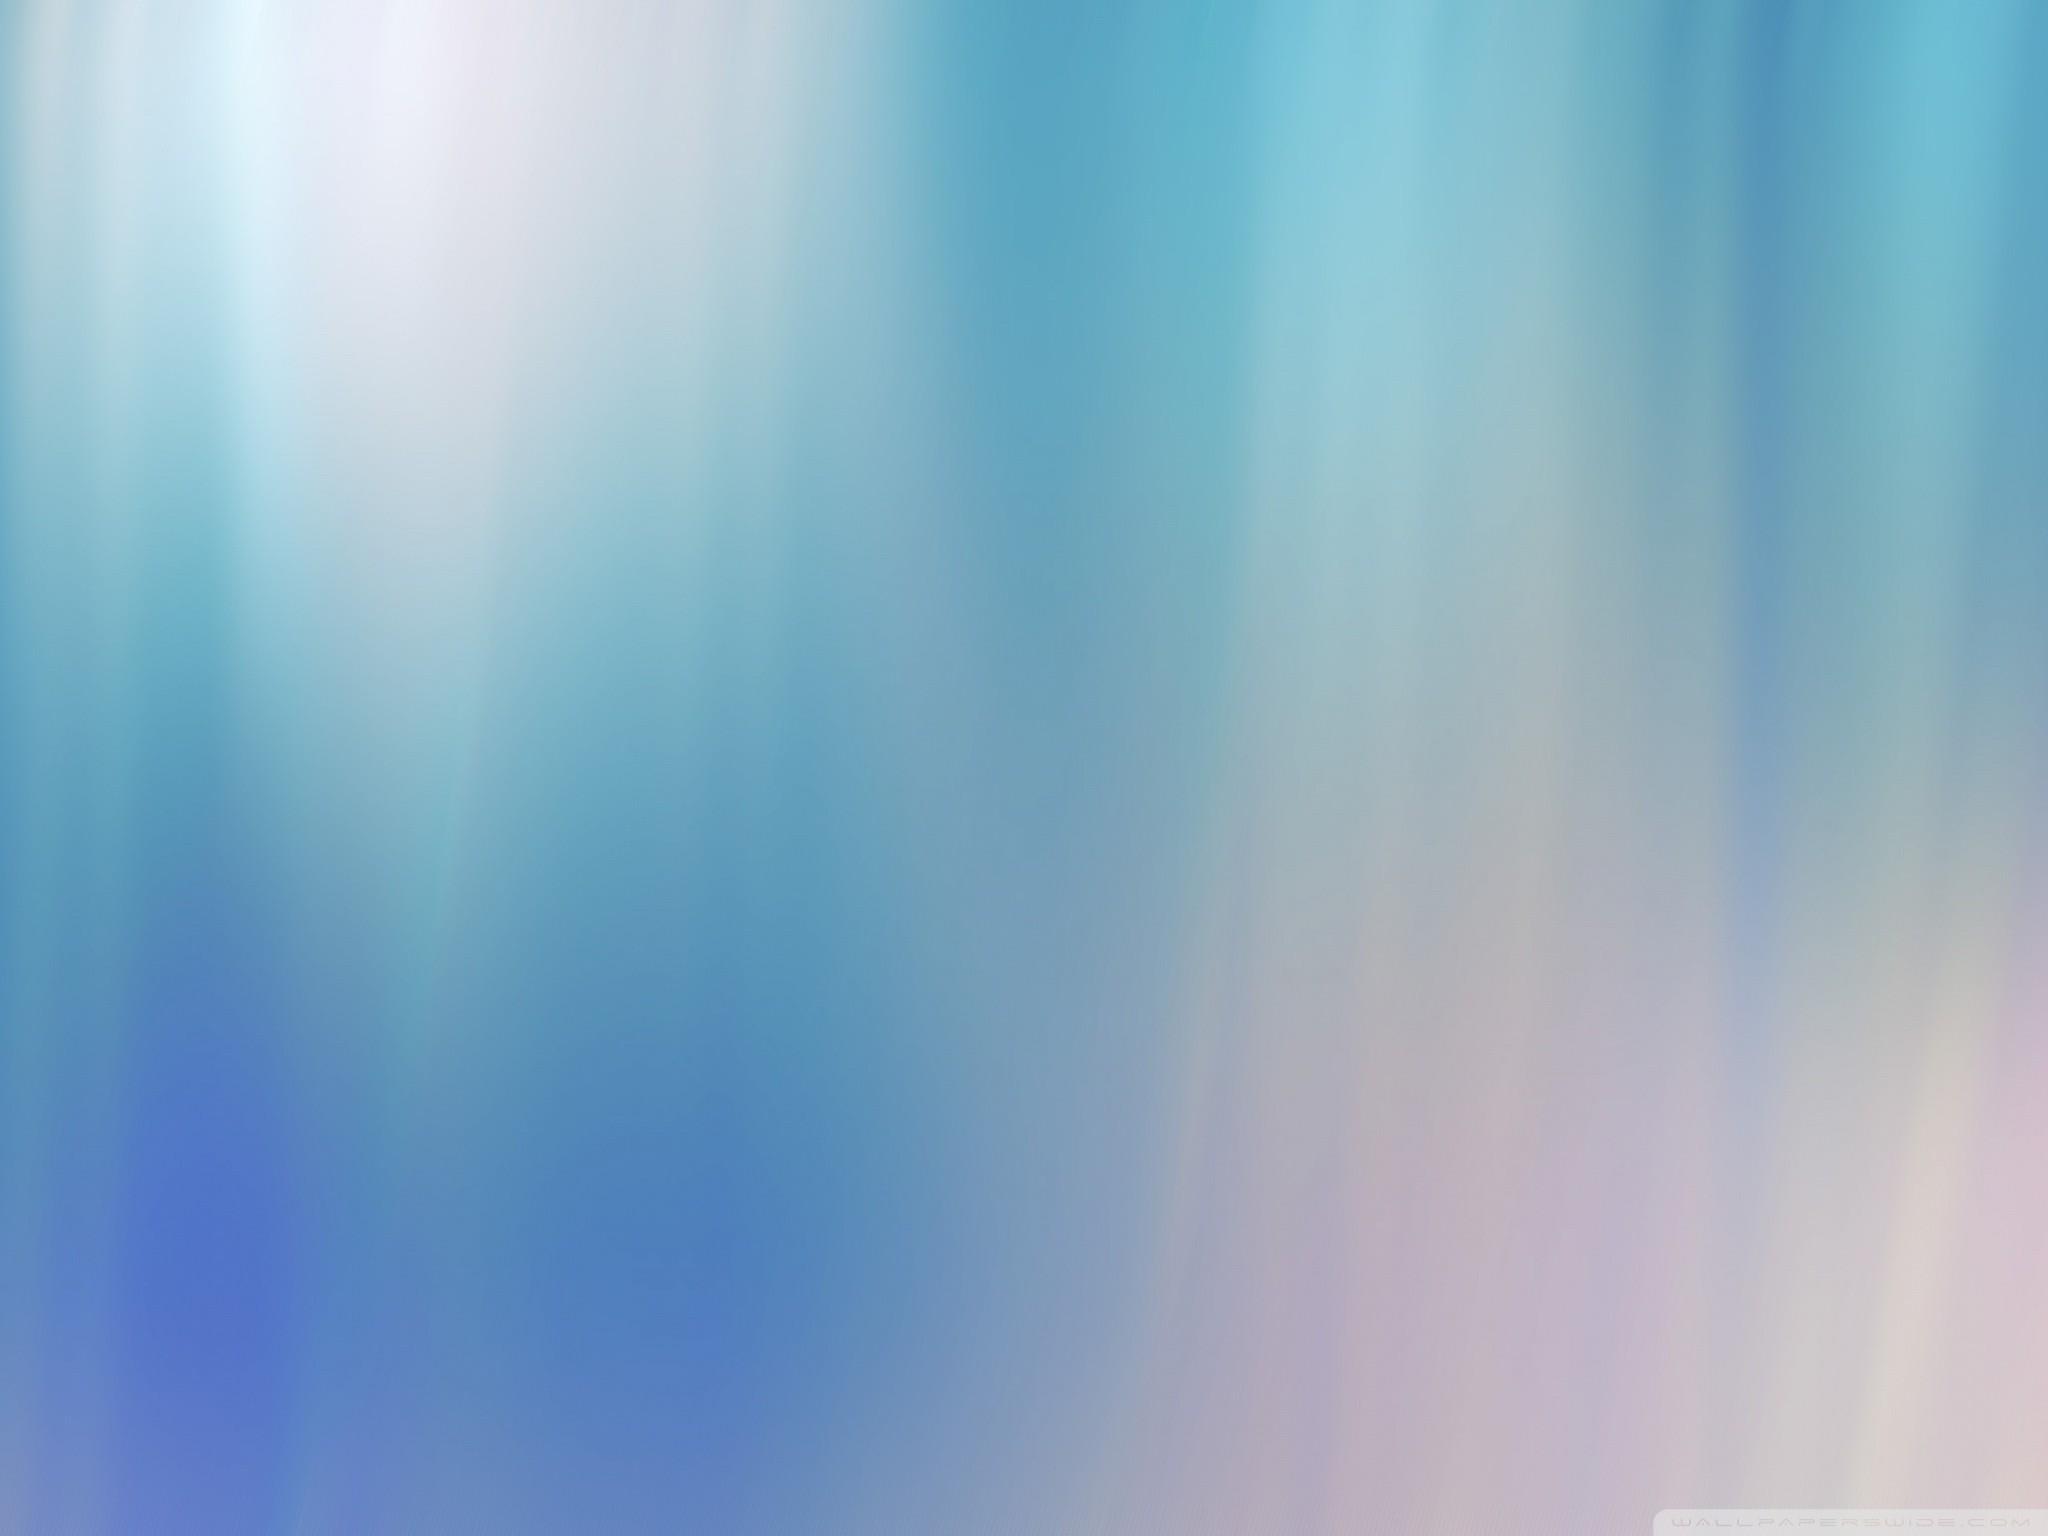 Light Gray Background ① Download Free Wallpapers For Desktop